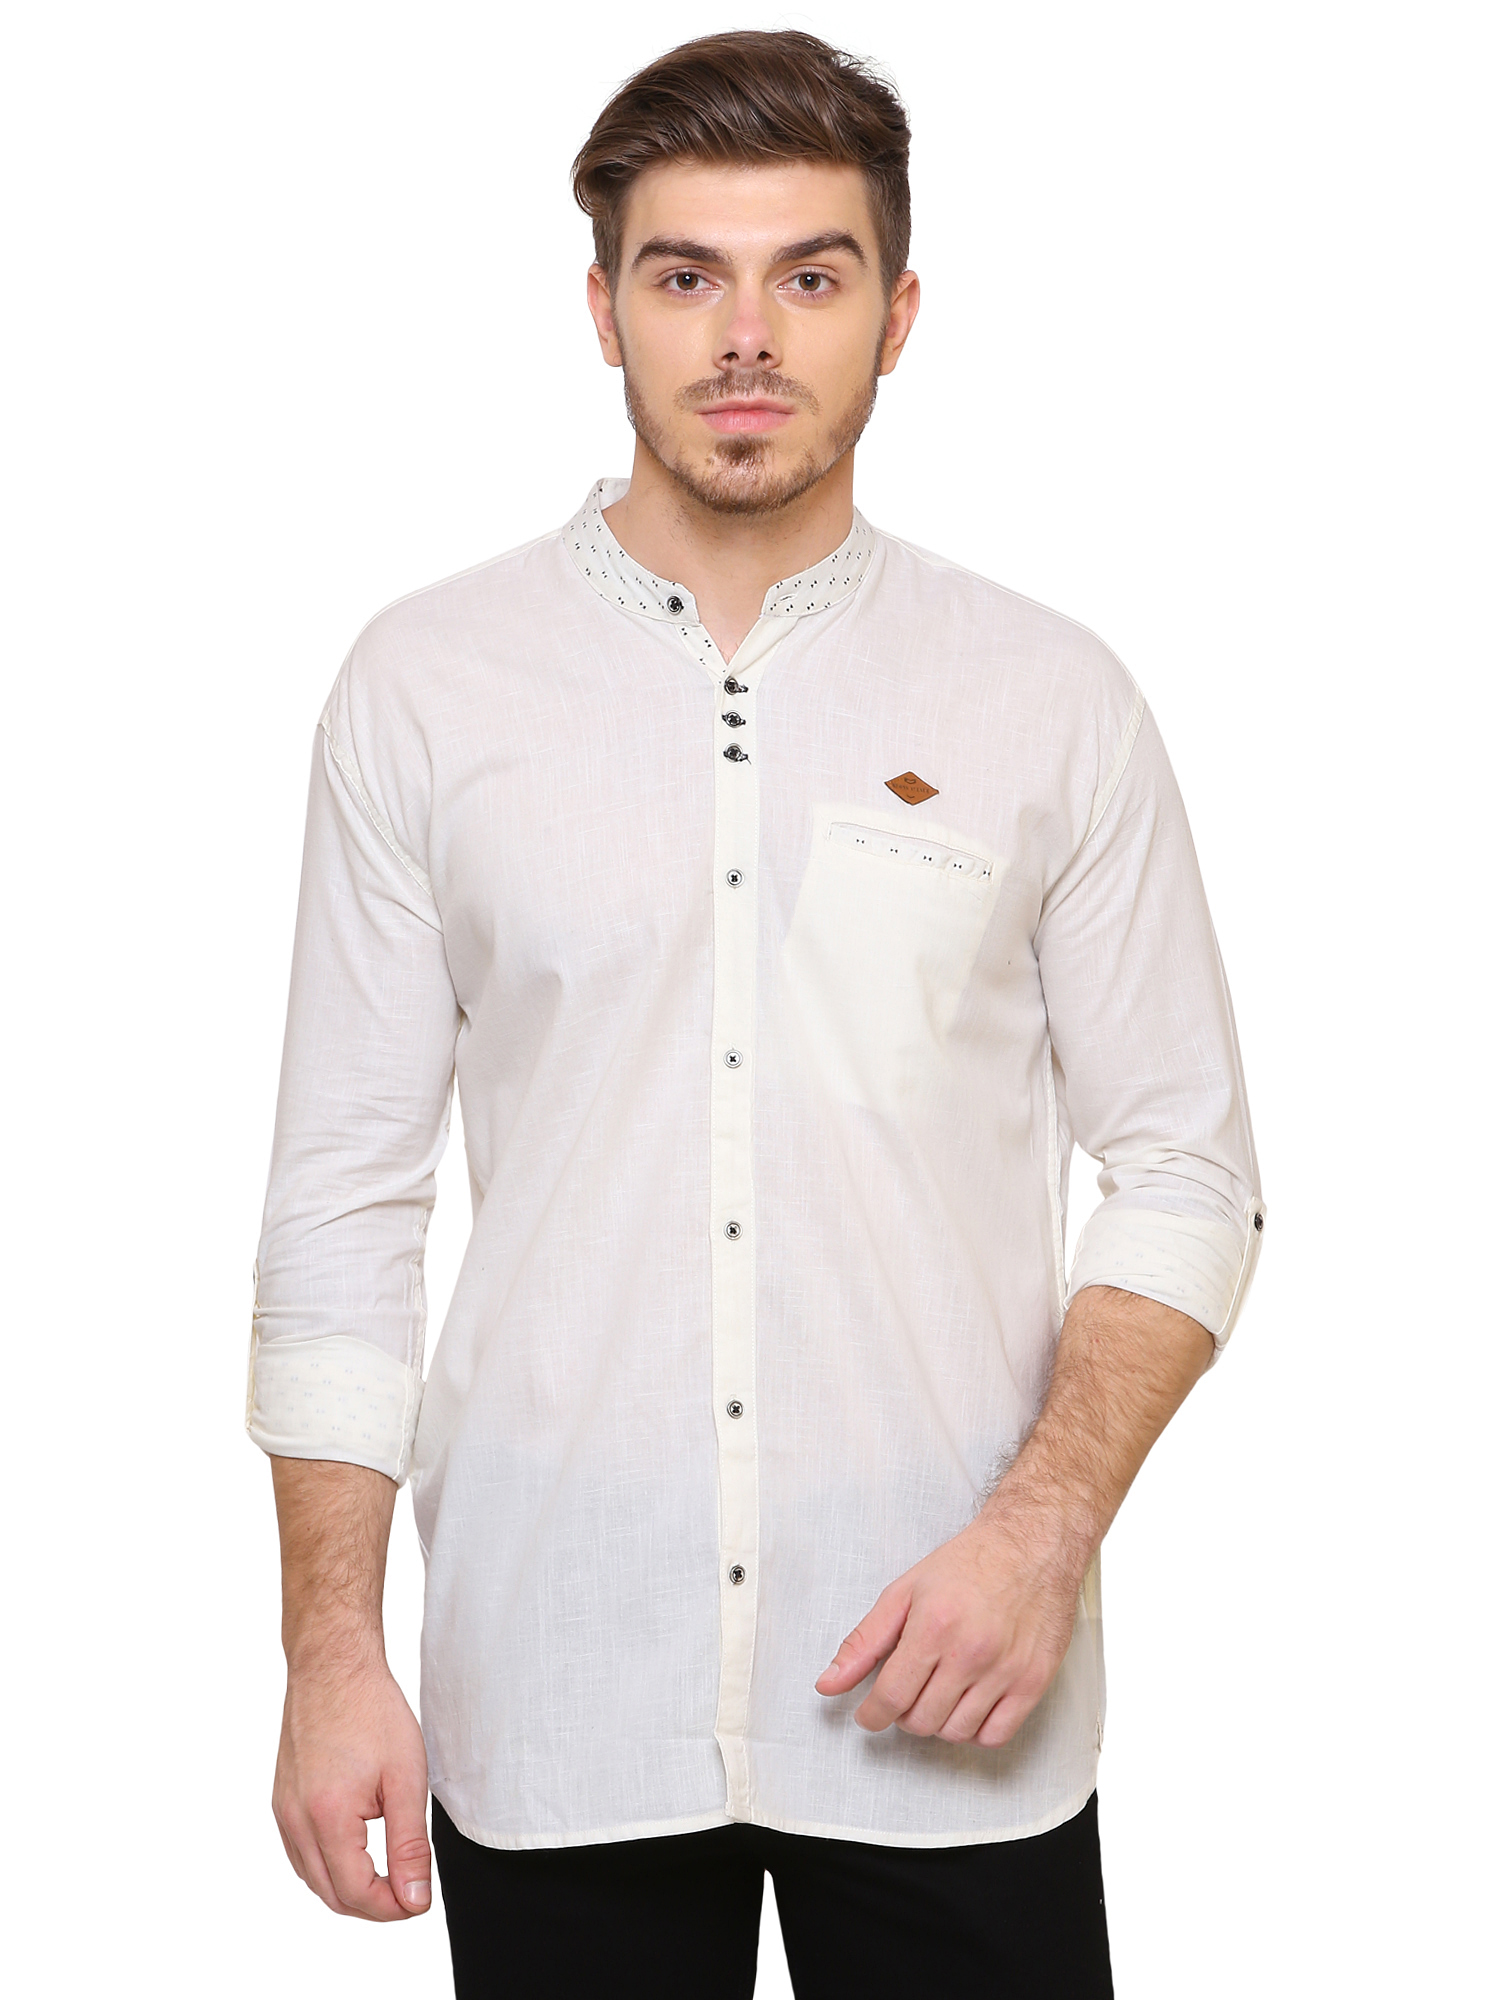 Kuons Avenue | Kuons Avenue Men's Beige Linen Cotton Shirt- KACLFS1165BE